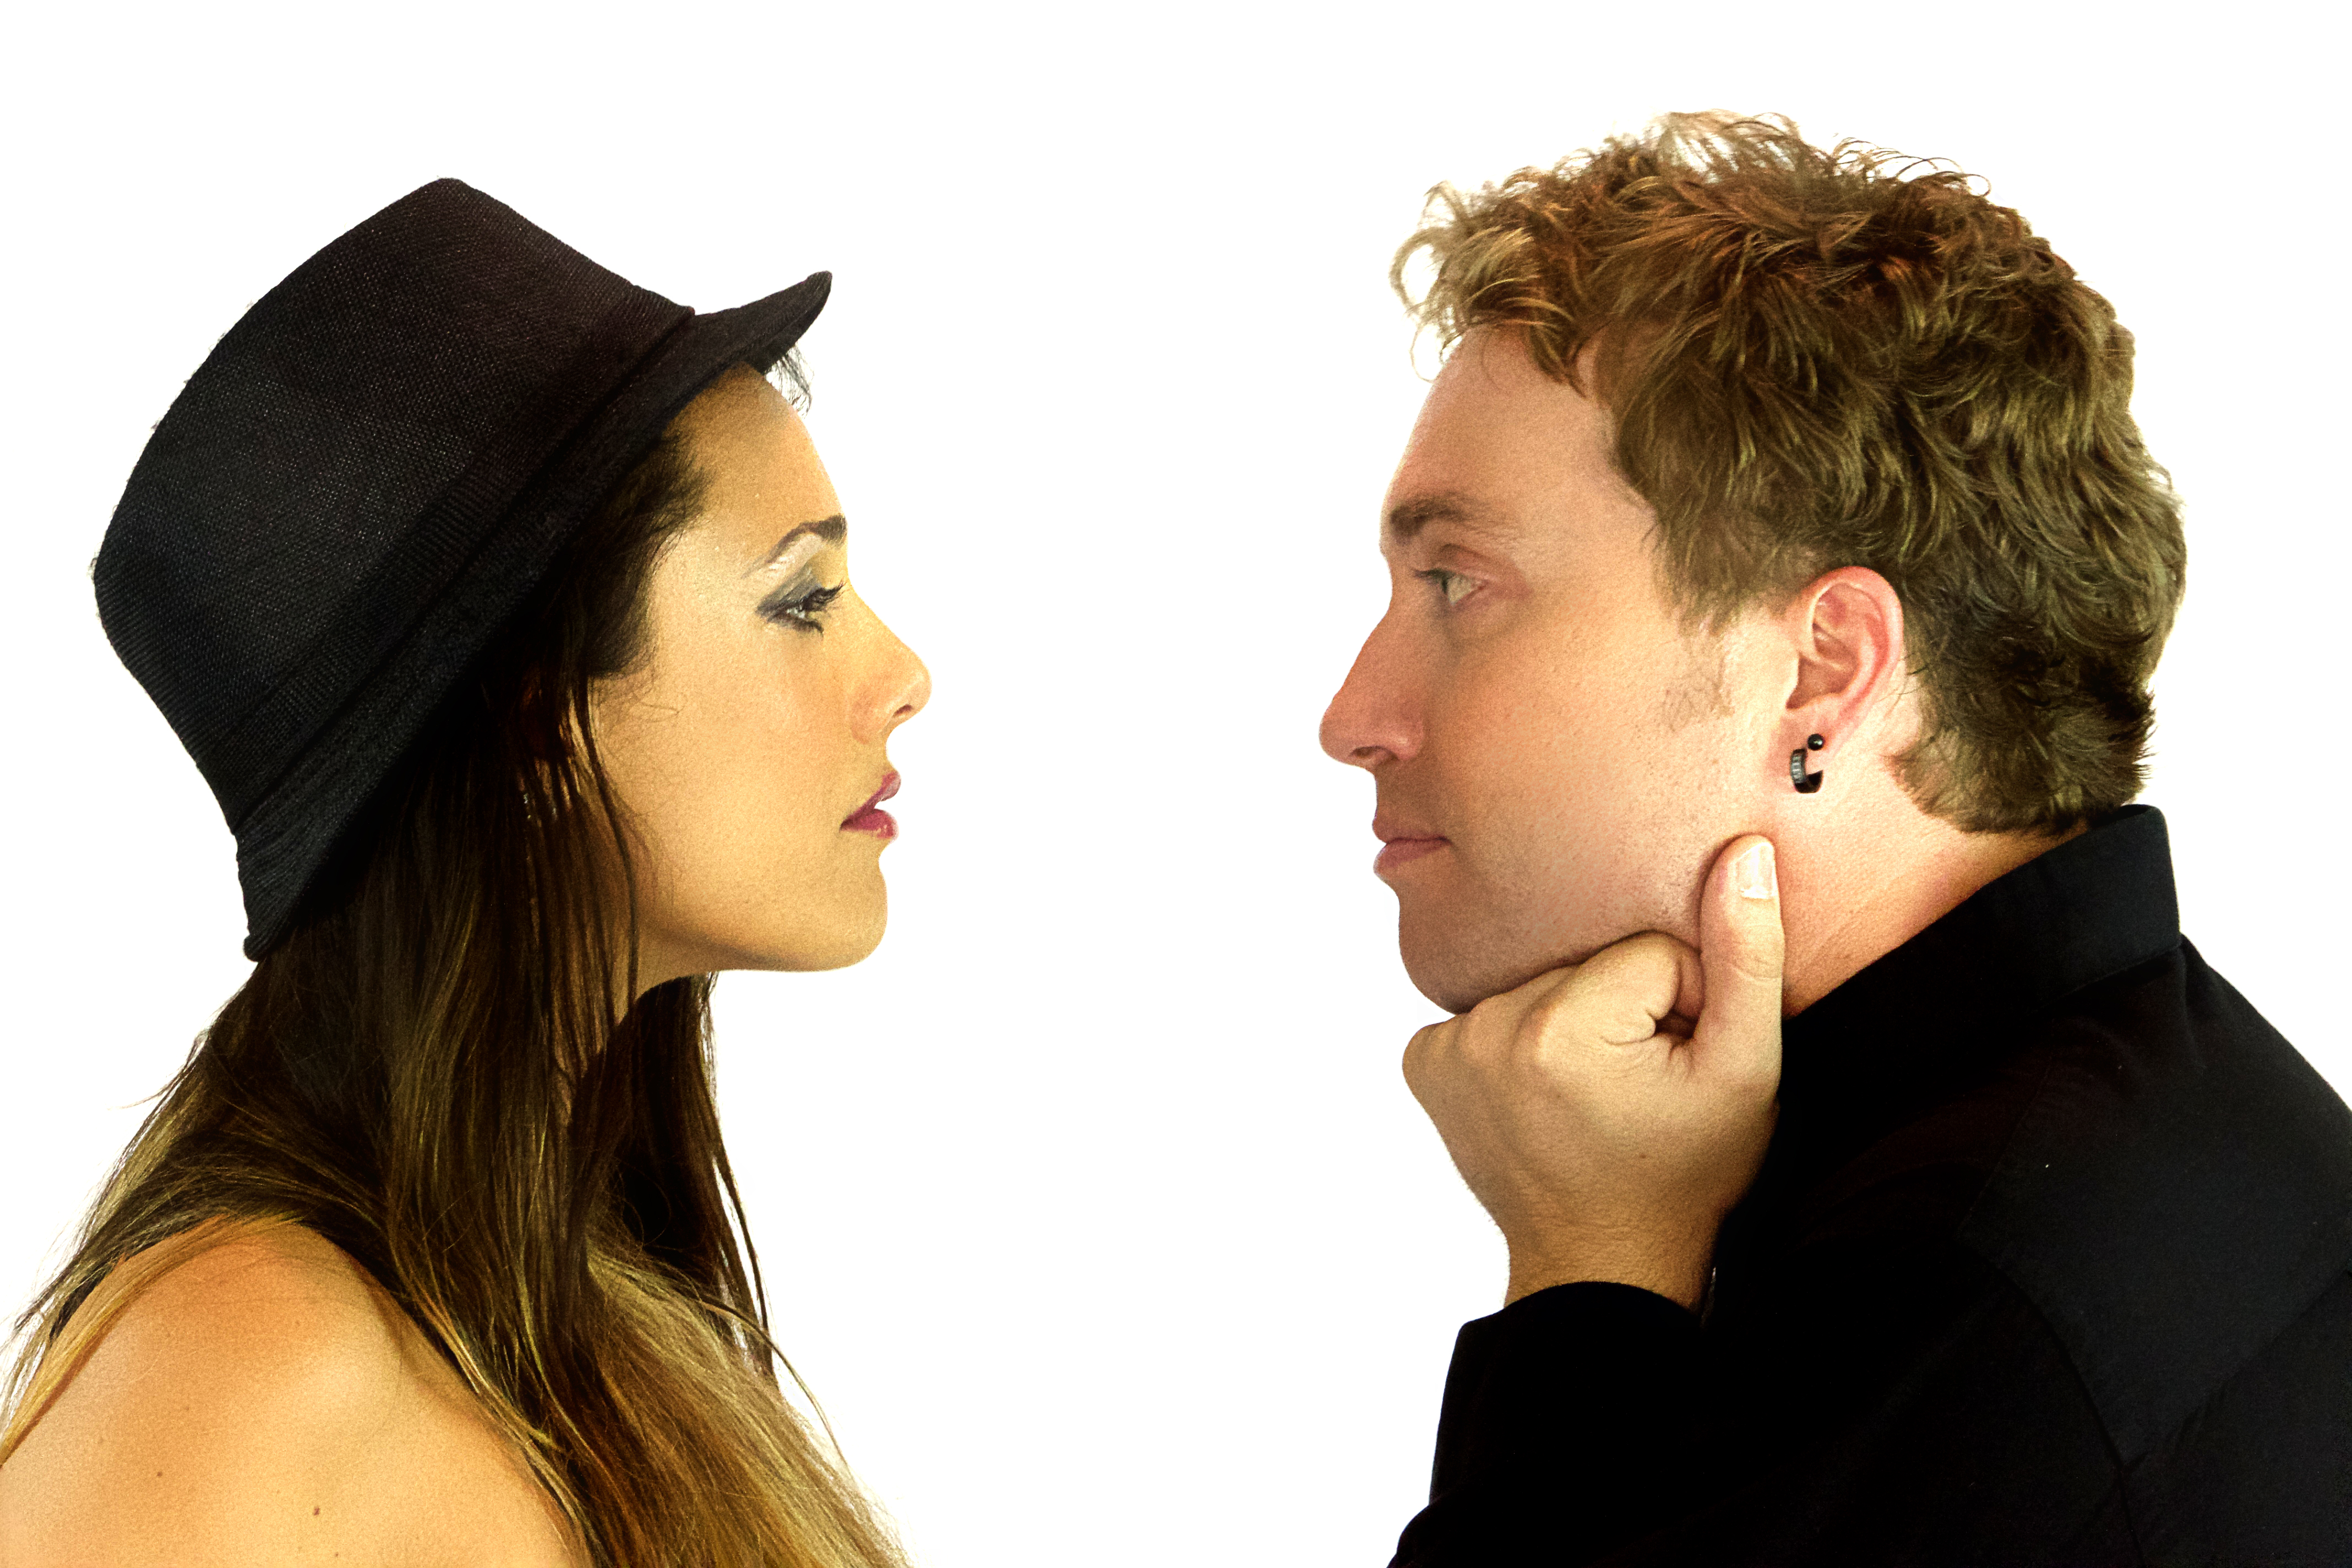 Lara and Michael